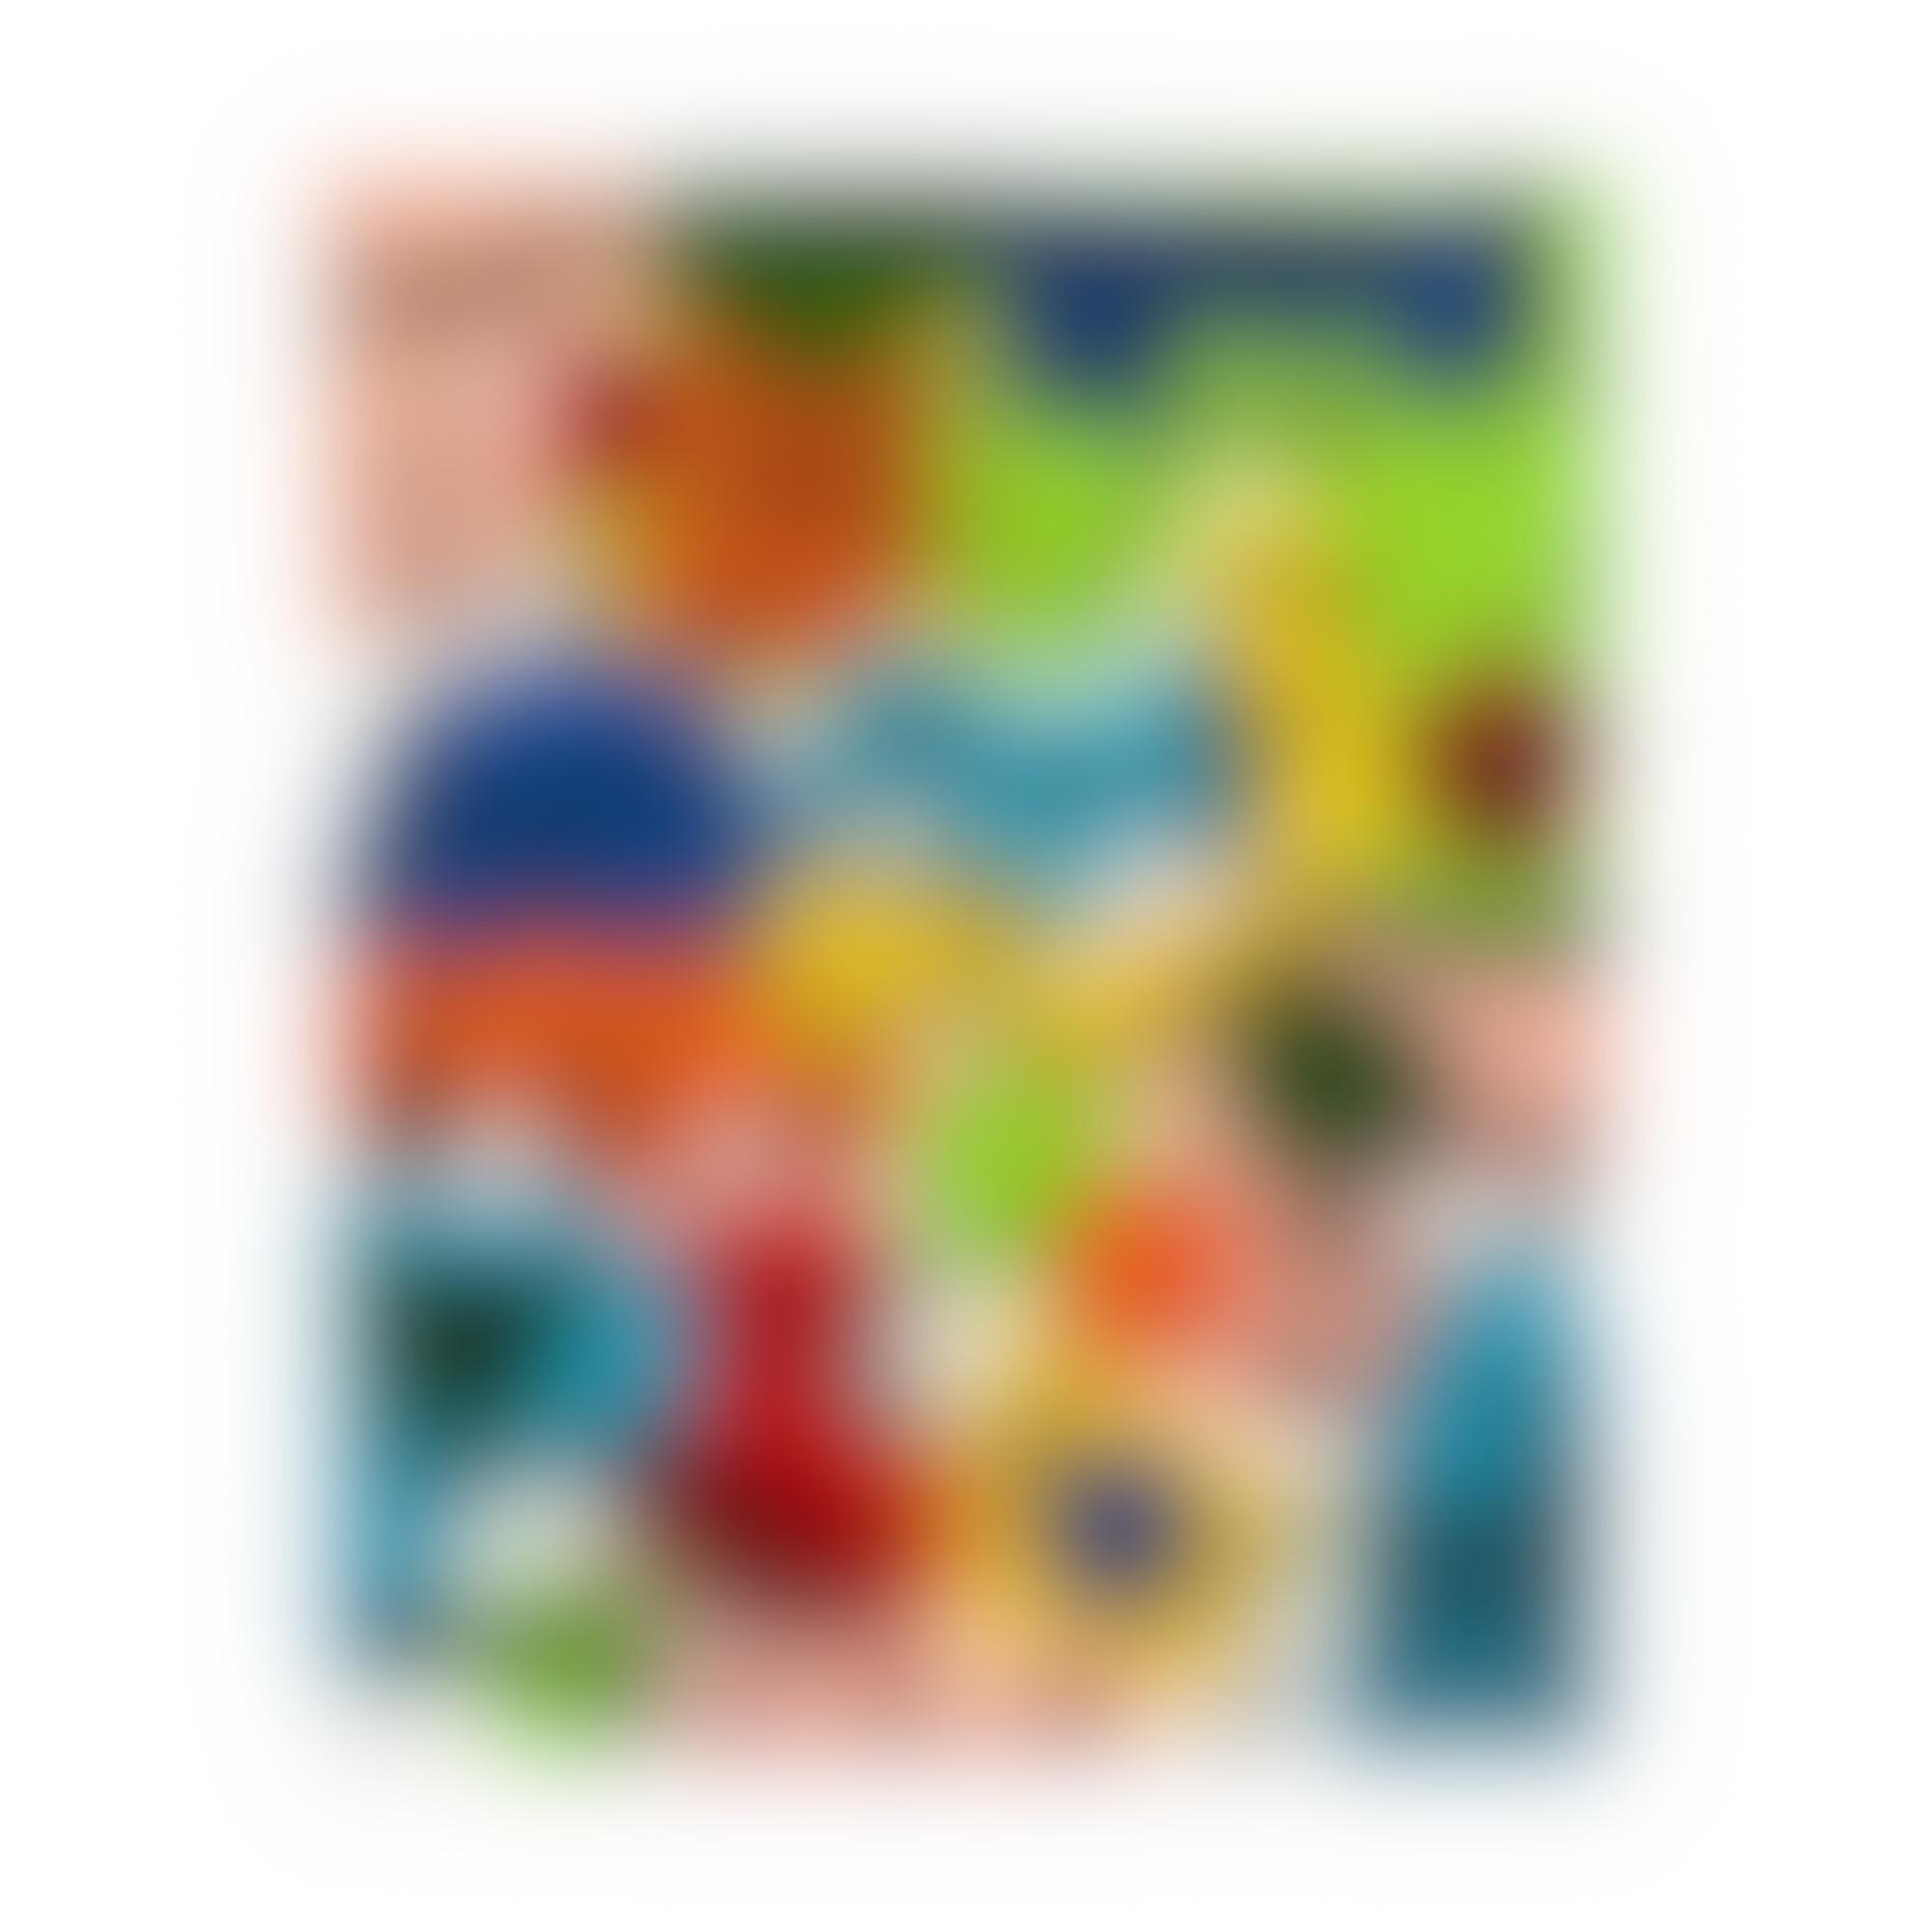 Caroline dowsett painter lecture in progress1 autocompressfitresizeixlibphp 1 1 0max h2000max w3 D2000q80s6ccbd28ccb72fd9bf32dc015bfdf26bc